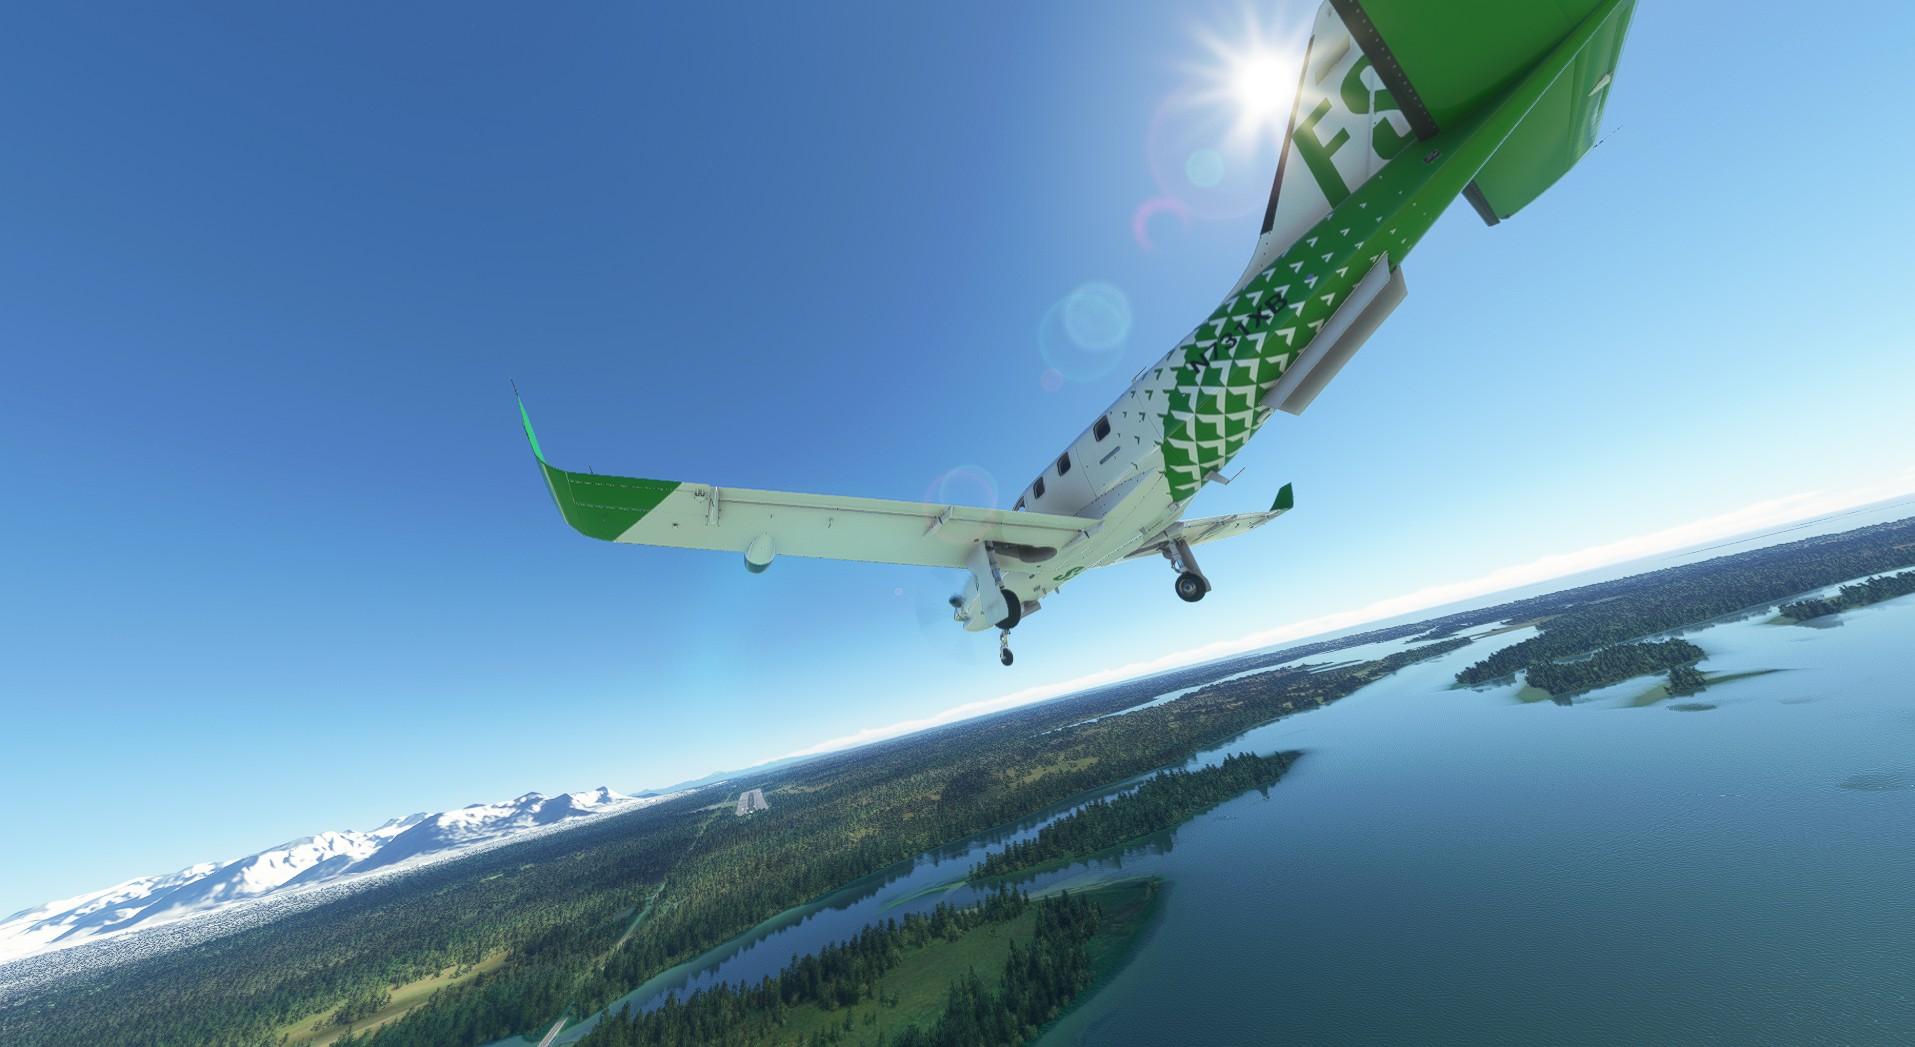 microsoft-flight-simulator-guide:-simple-tools-for-basic-flight-planning